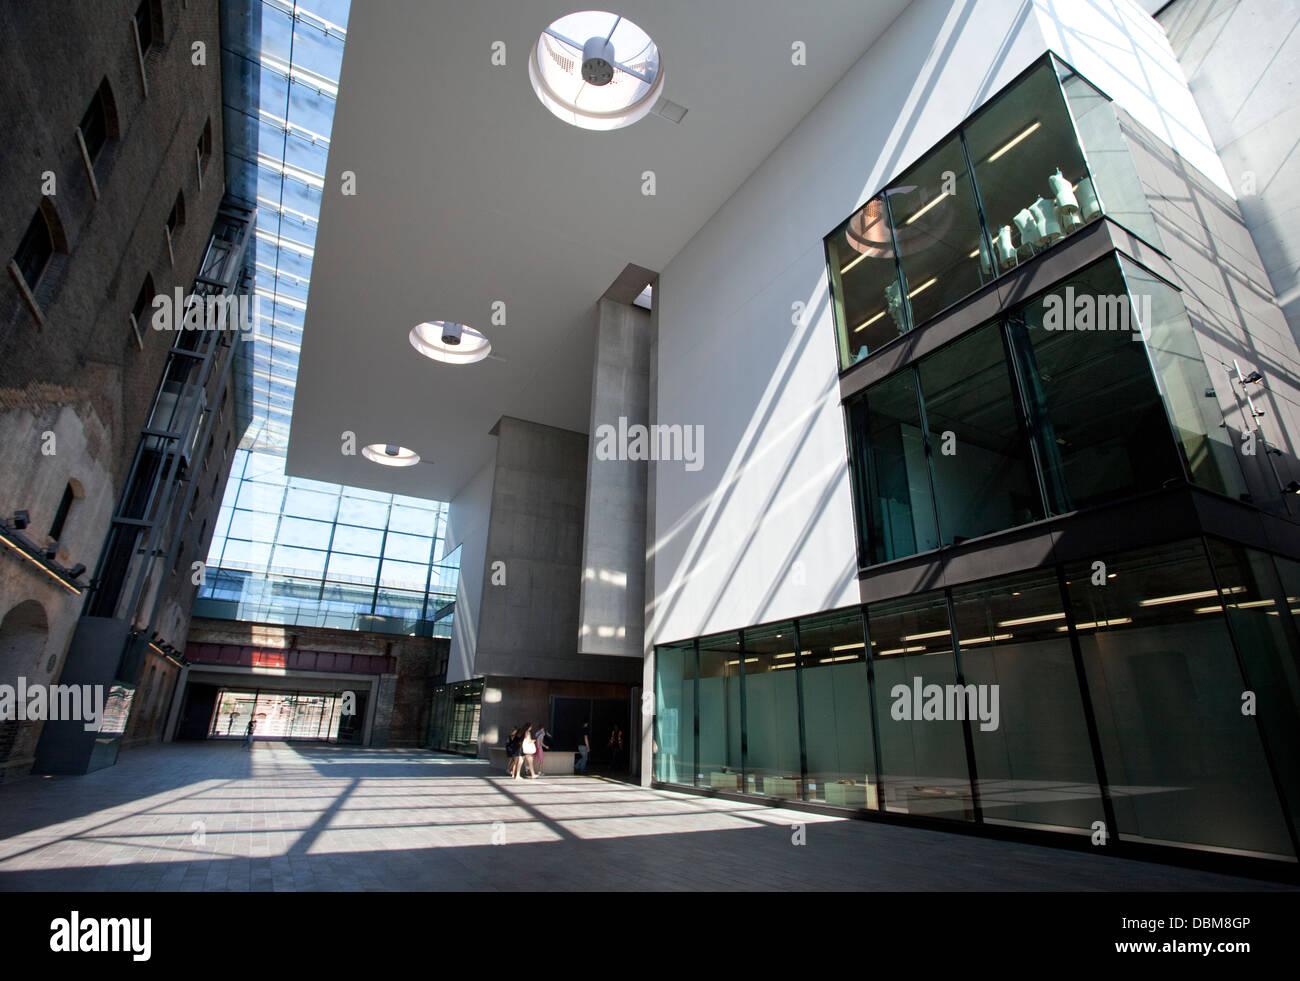 Central Saint Martins College Of Art And Design Summer School